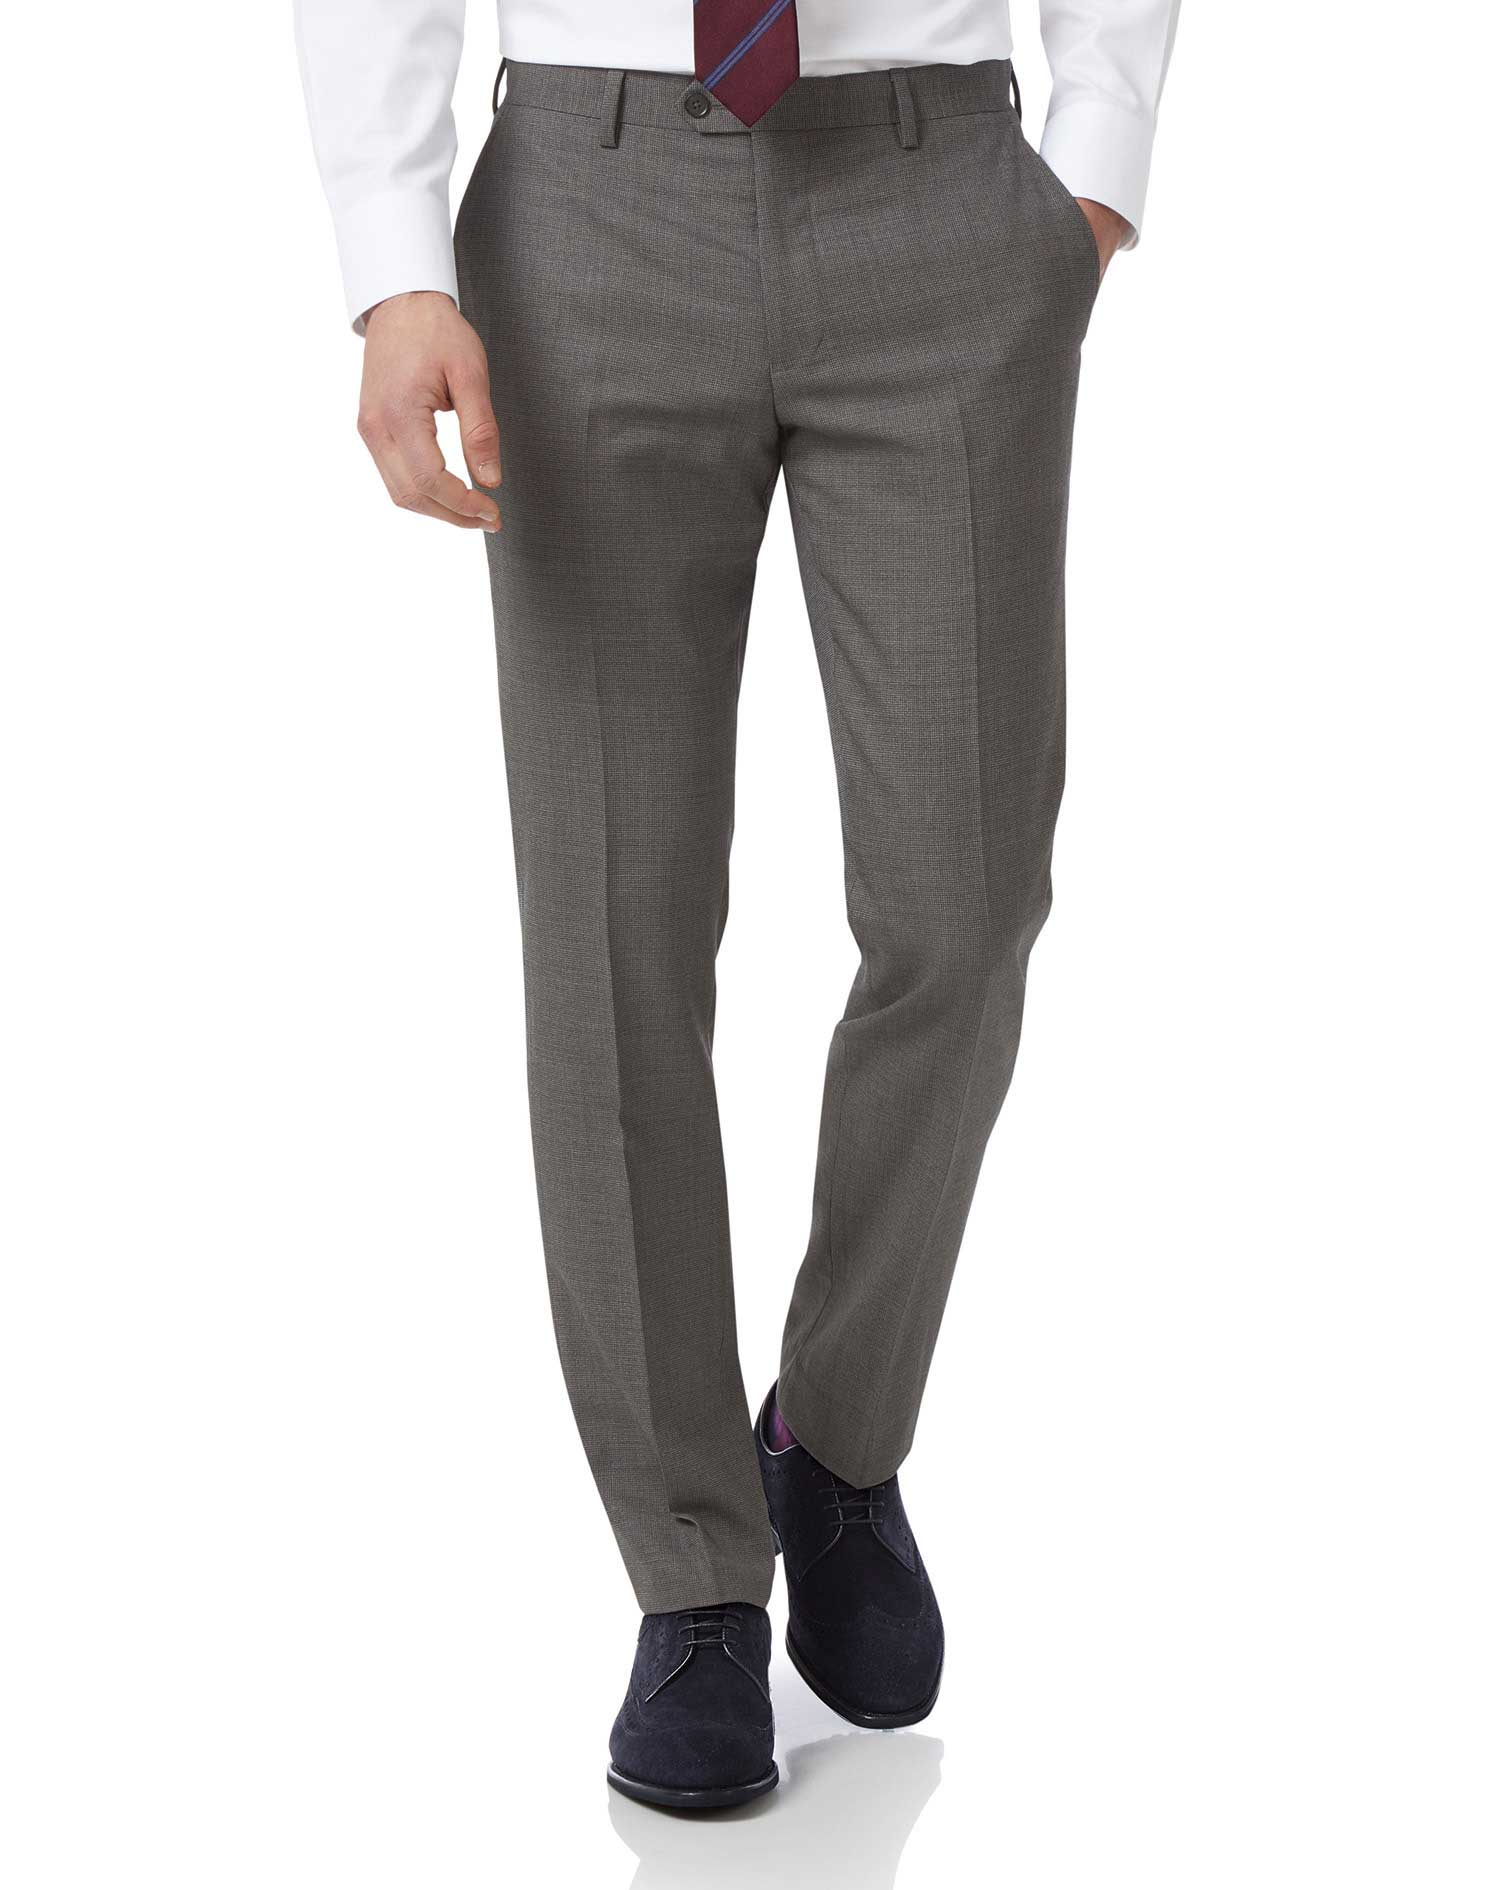 Grey Slim Jaspe Business Suit Trousers Size W32 L34 by Charles Tyrwhitt